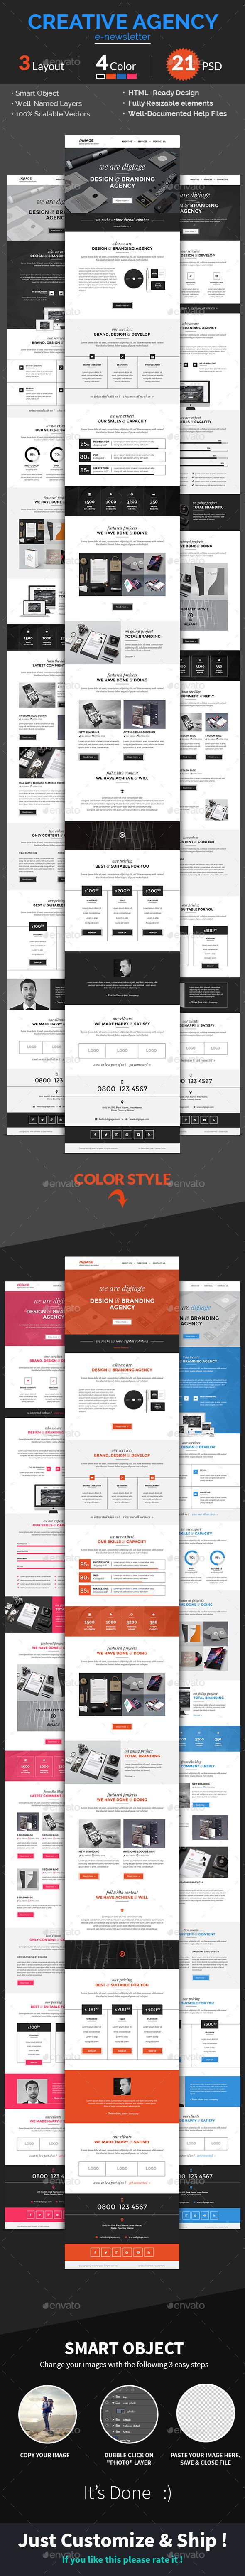 Creative Agency / Multipurpose E-newsletter PSD Te - E-newsletters Web Elements